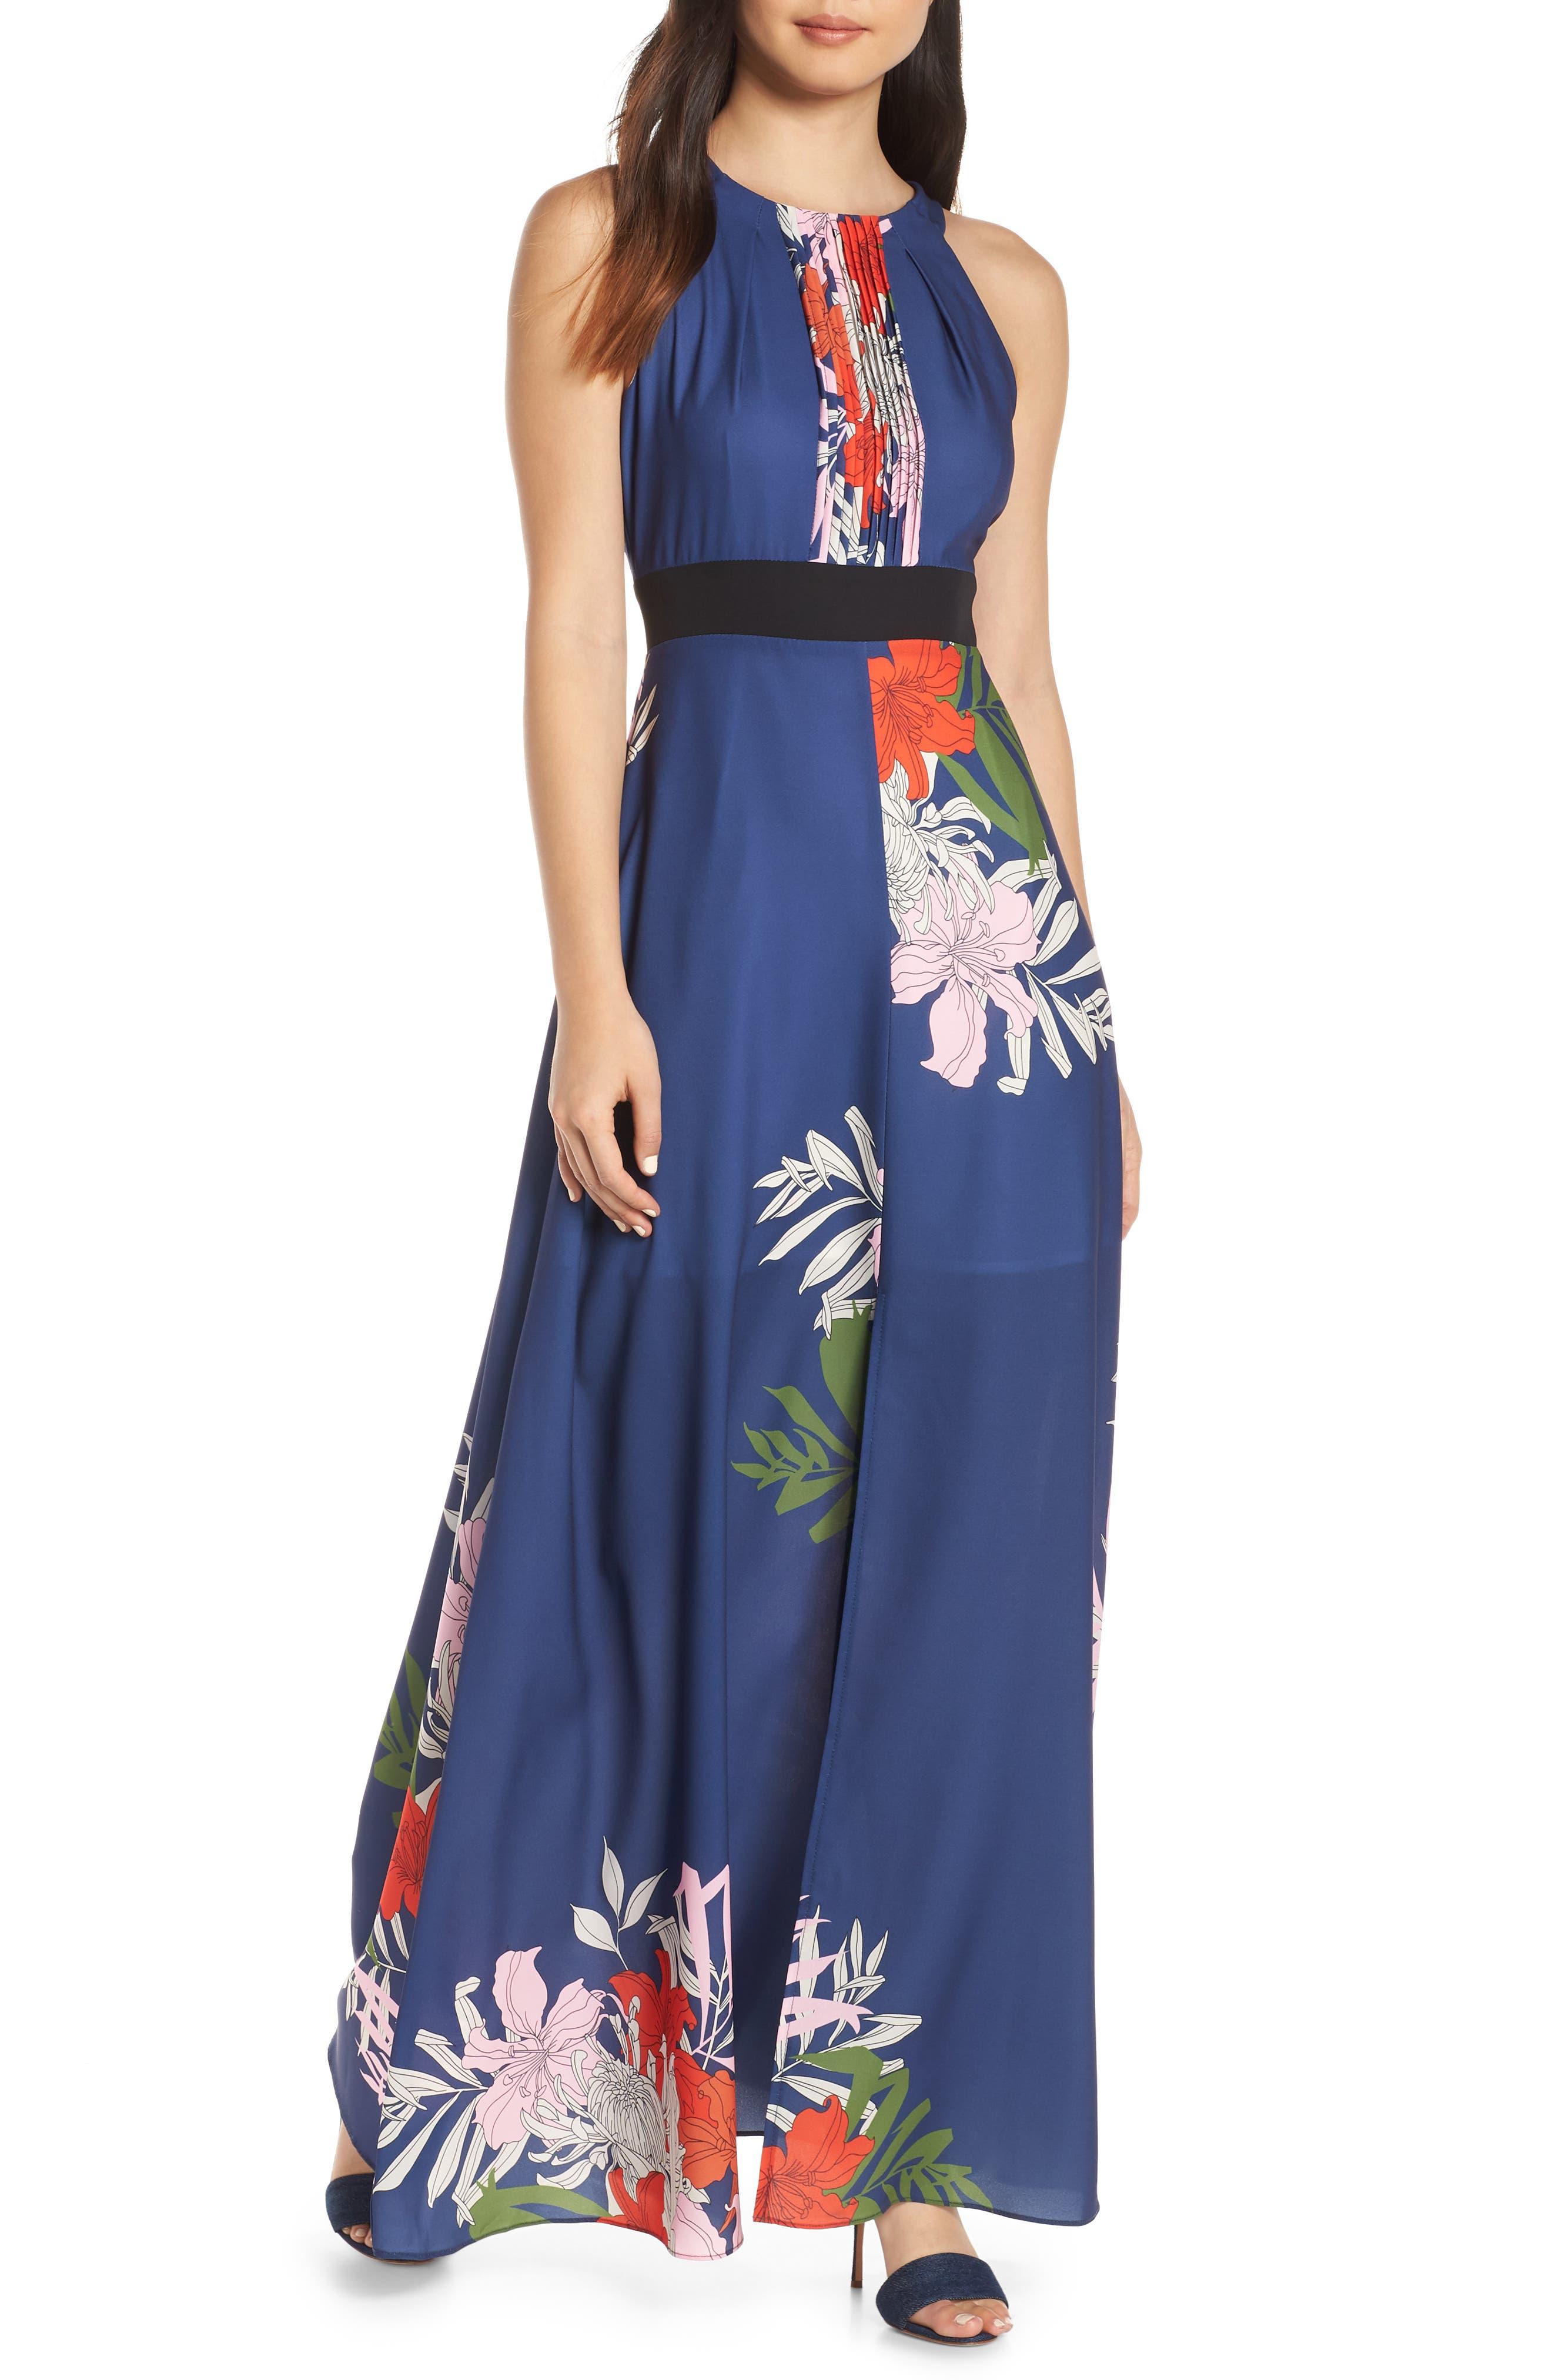 Palmira Maxi Dress,                             Main thumbnail 1, color,                             NAVY MULTI